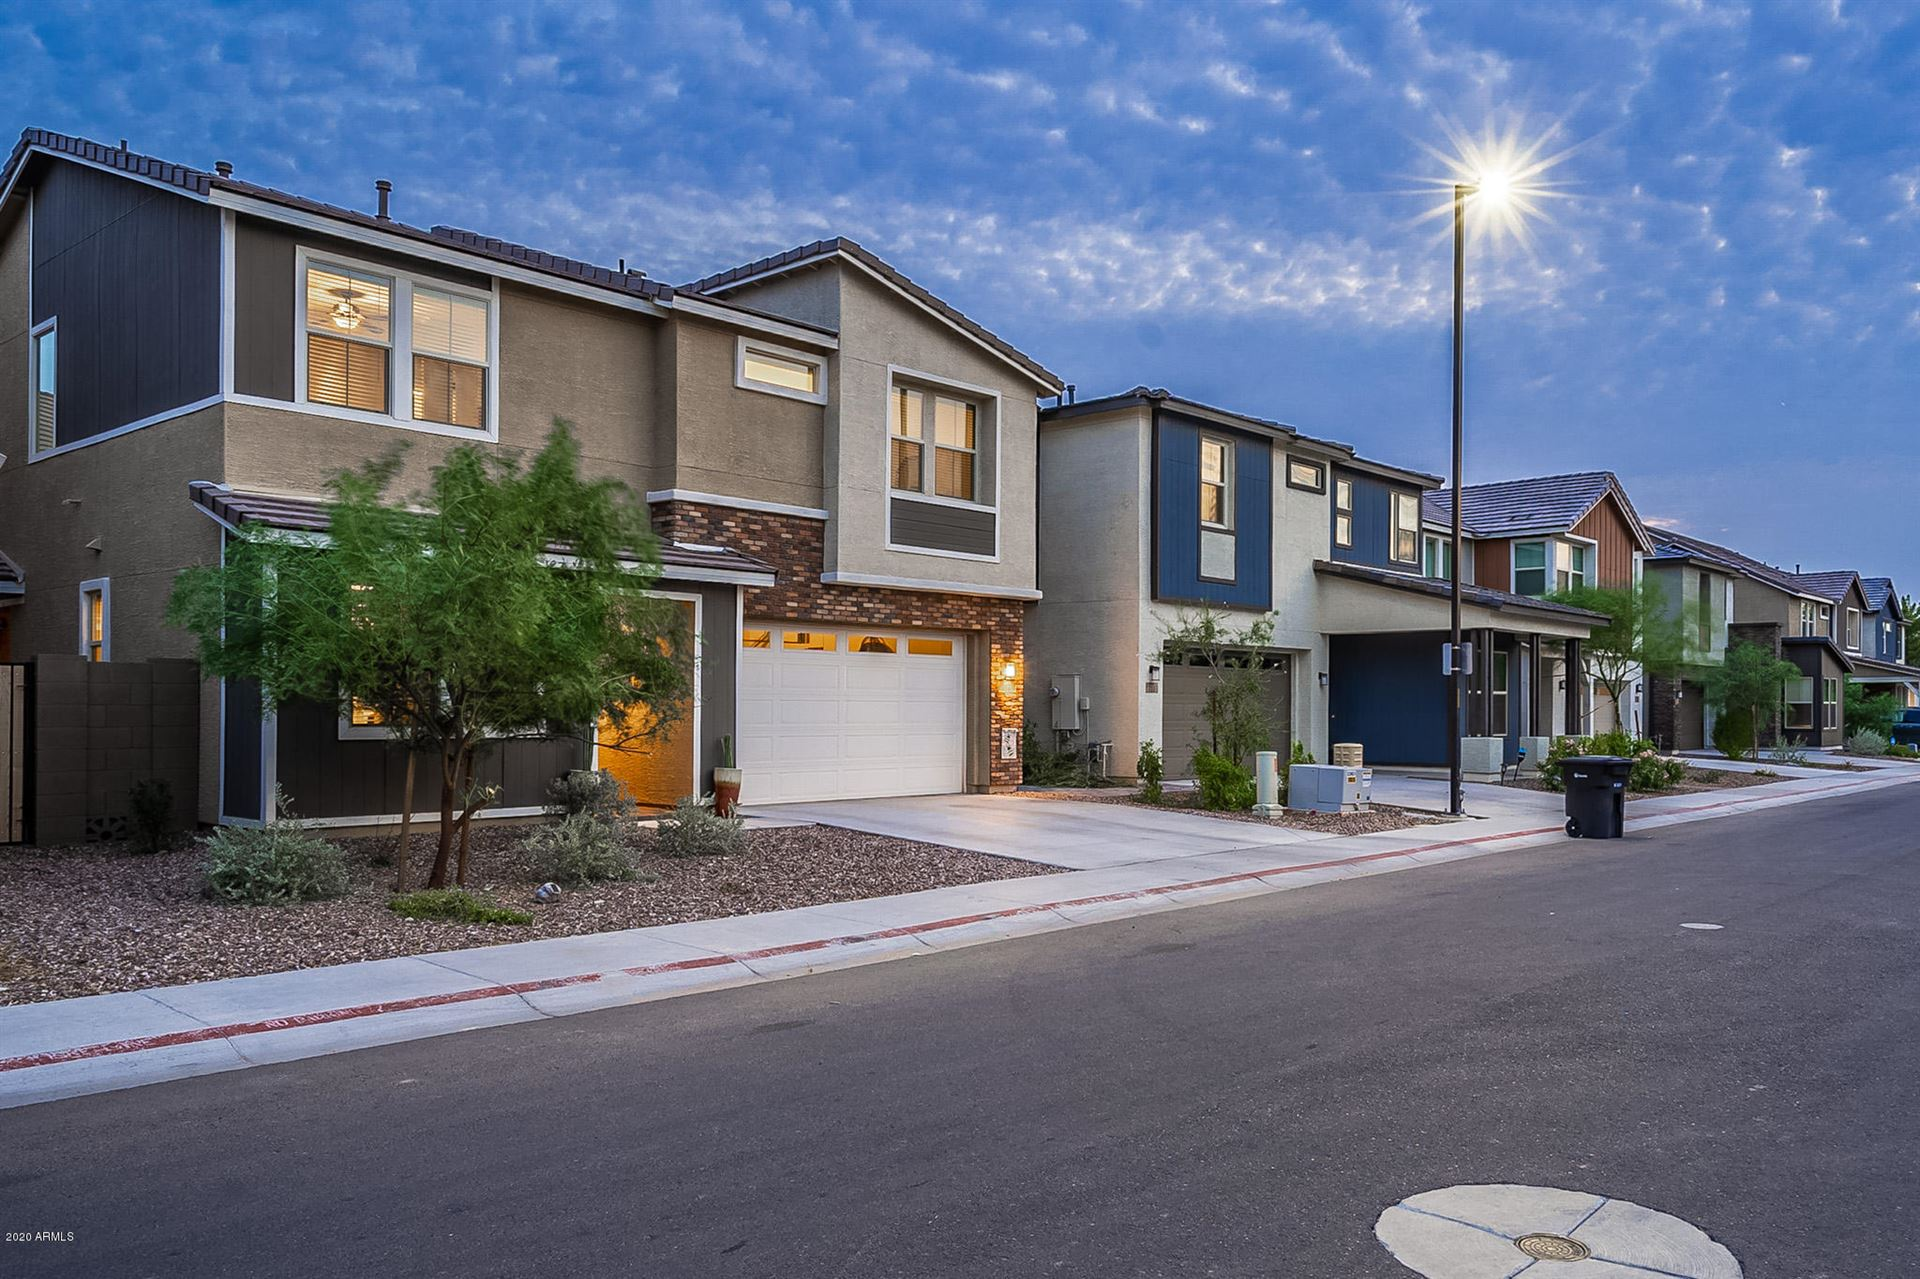 743 W BROWNING Place, Chandler, AZ 85286 - MLS#: 6121292